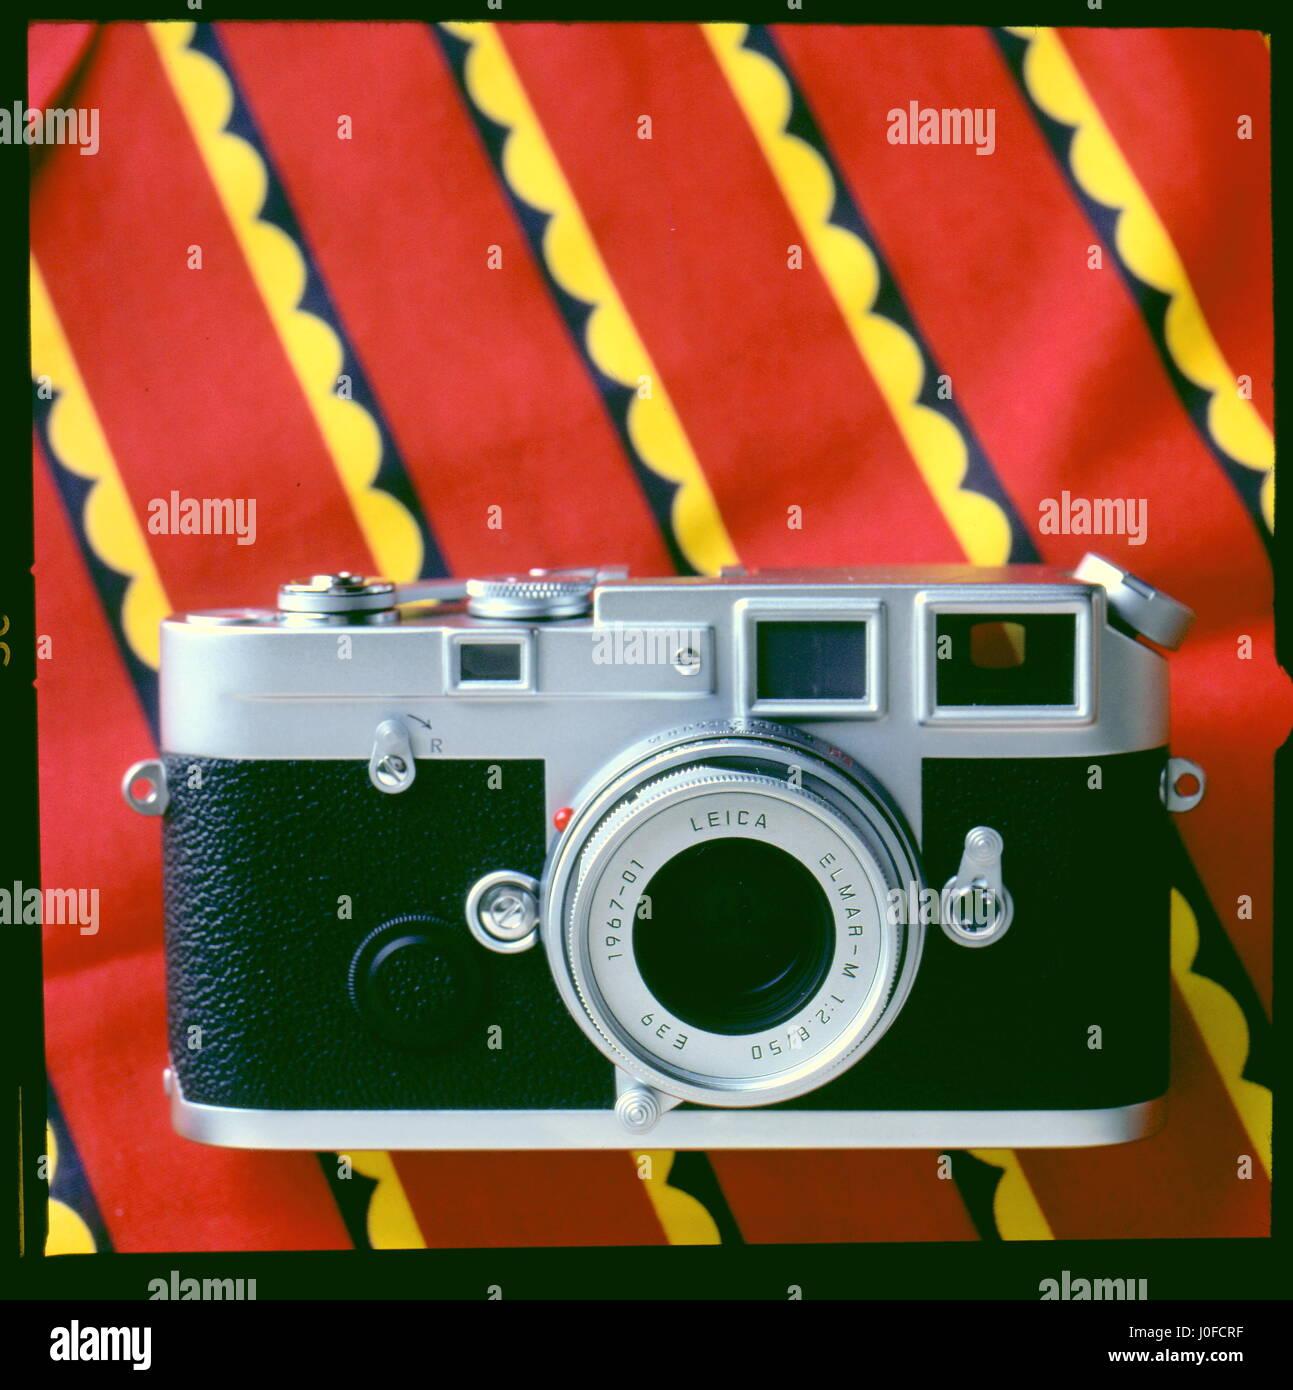 AJAXNETPHOTO. UNITED KINGDOM. -  CLASSIC LEICA CAMERA - NEW SPECIAL EDITION SILVER JUBILEE M6-J WITH ELMAR-M F/2.8 - Stock Image